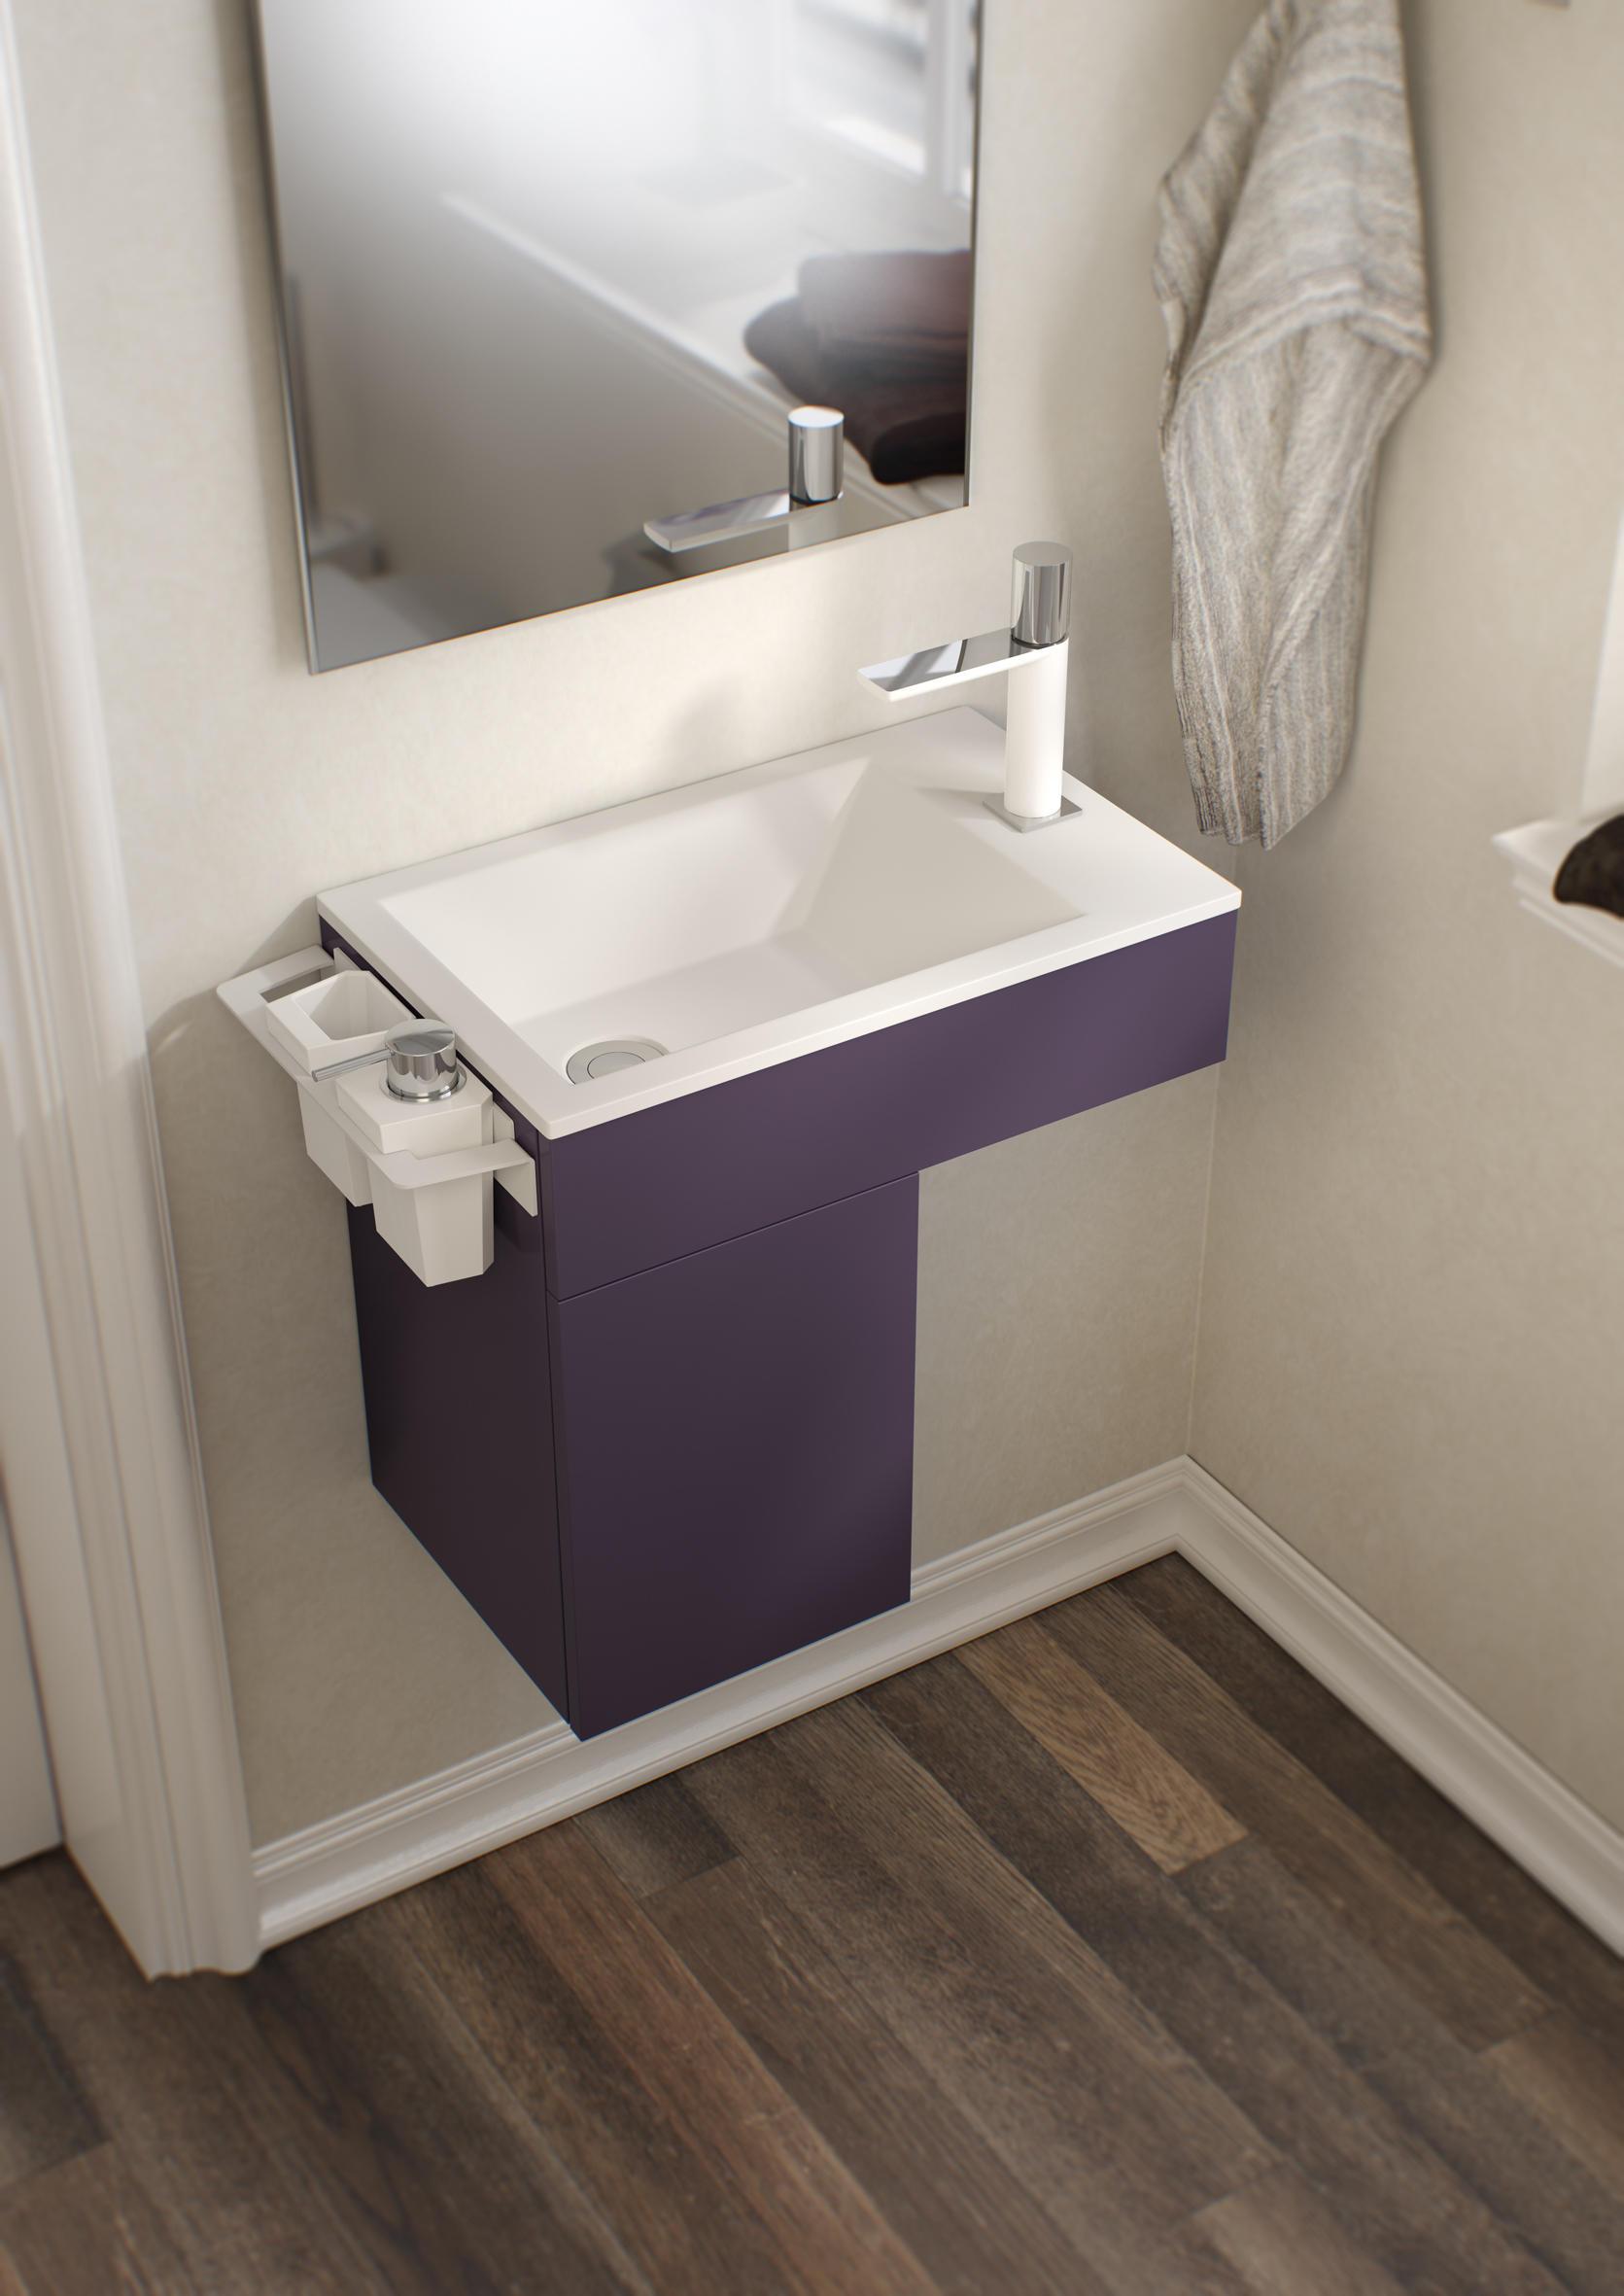 Puzzle t barra 300 estanter as toallas de sonia architonic for Estanteria bano toallas